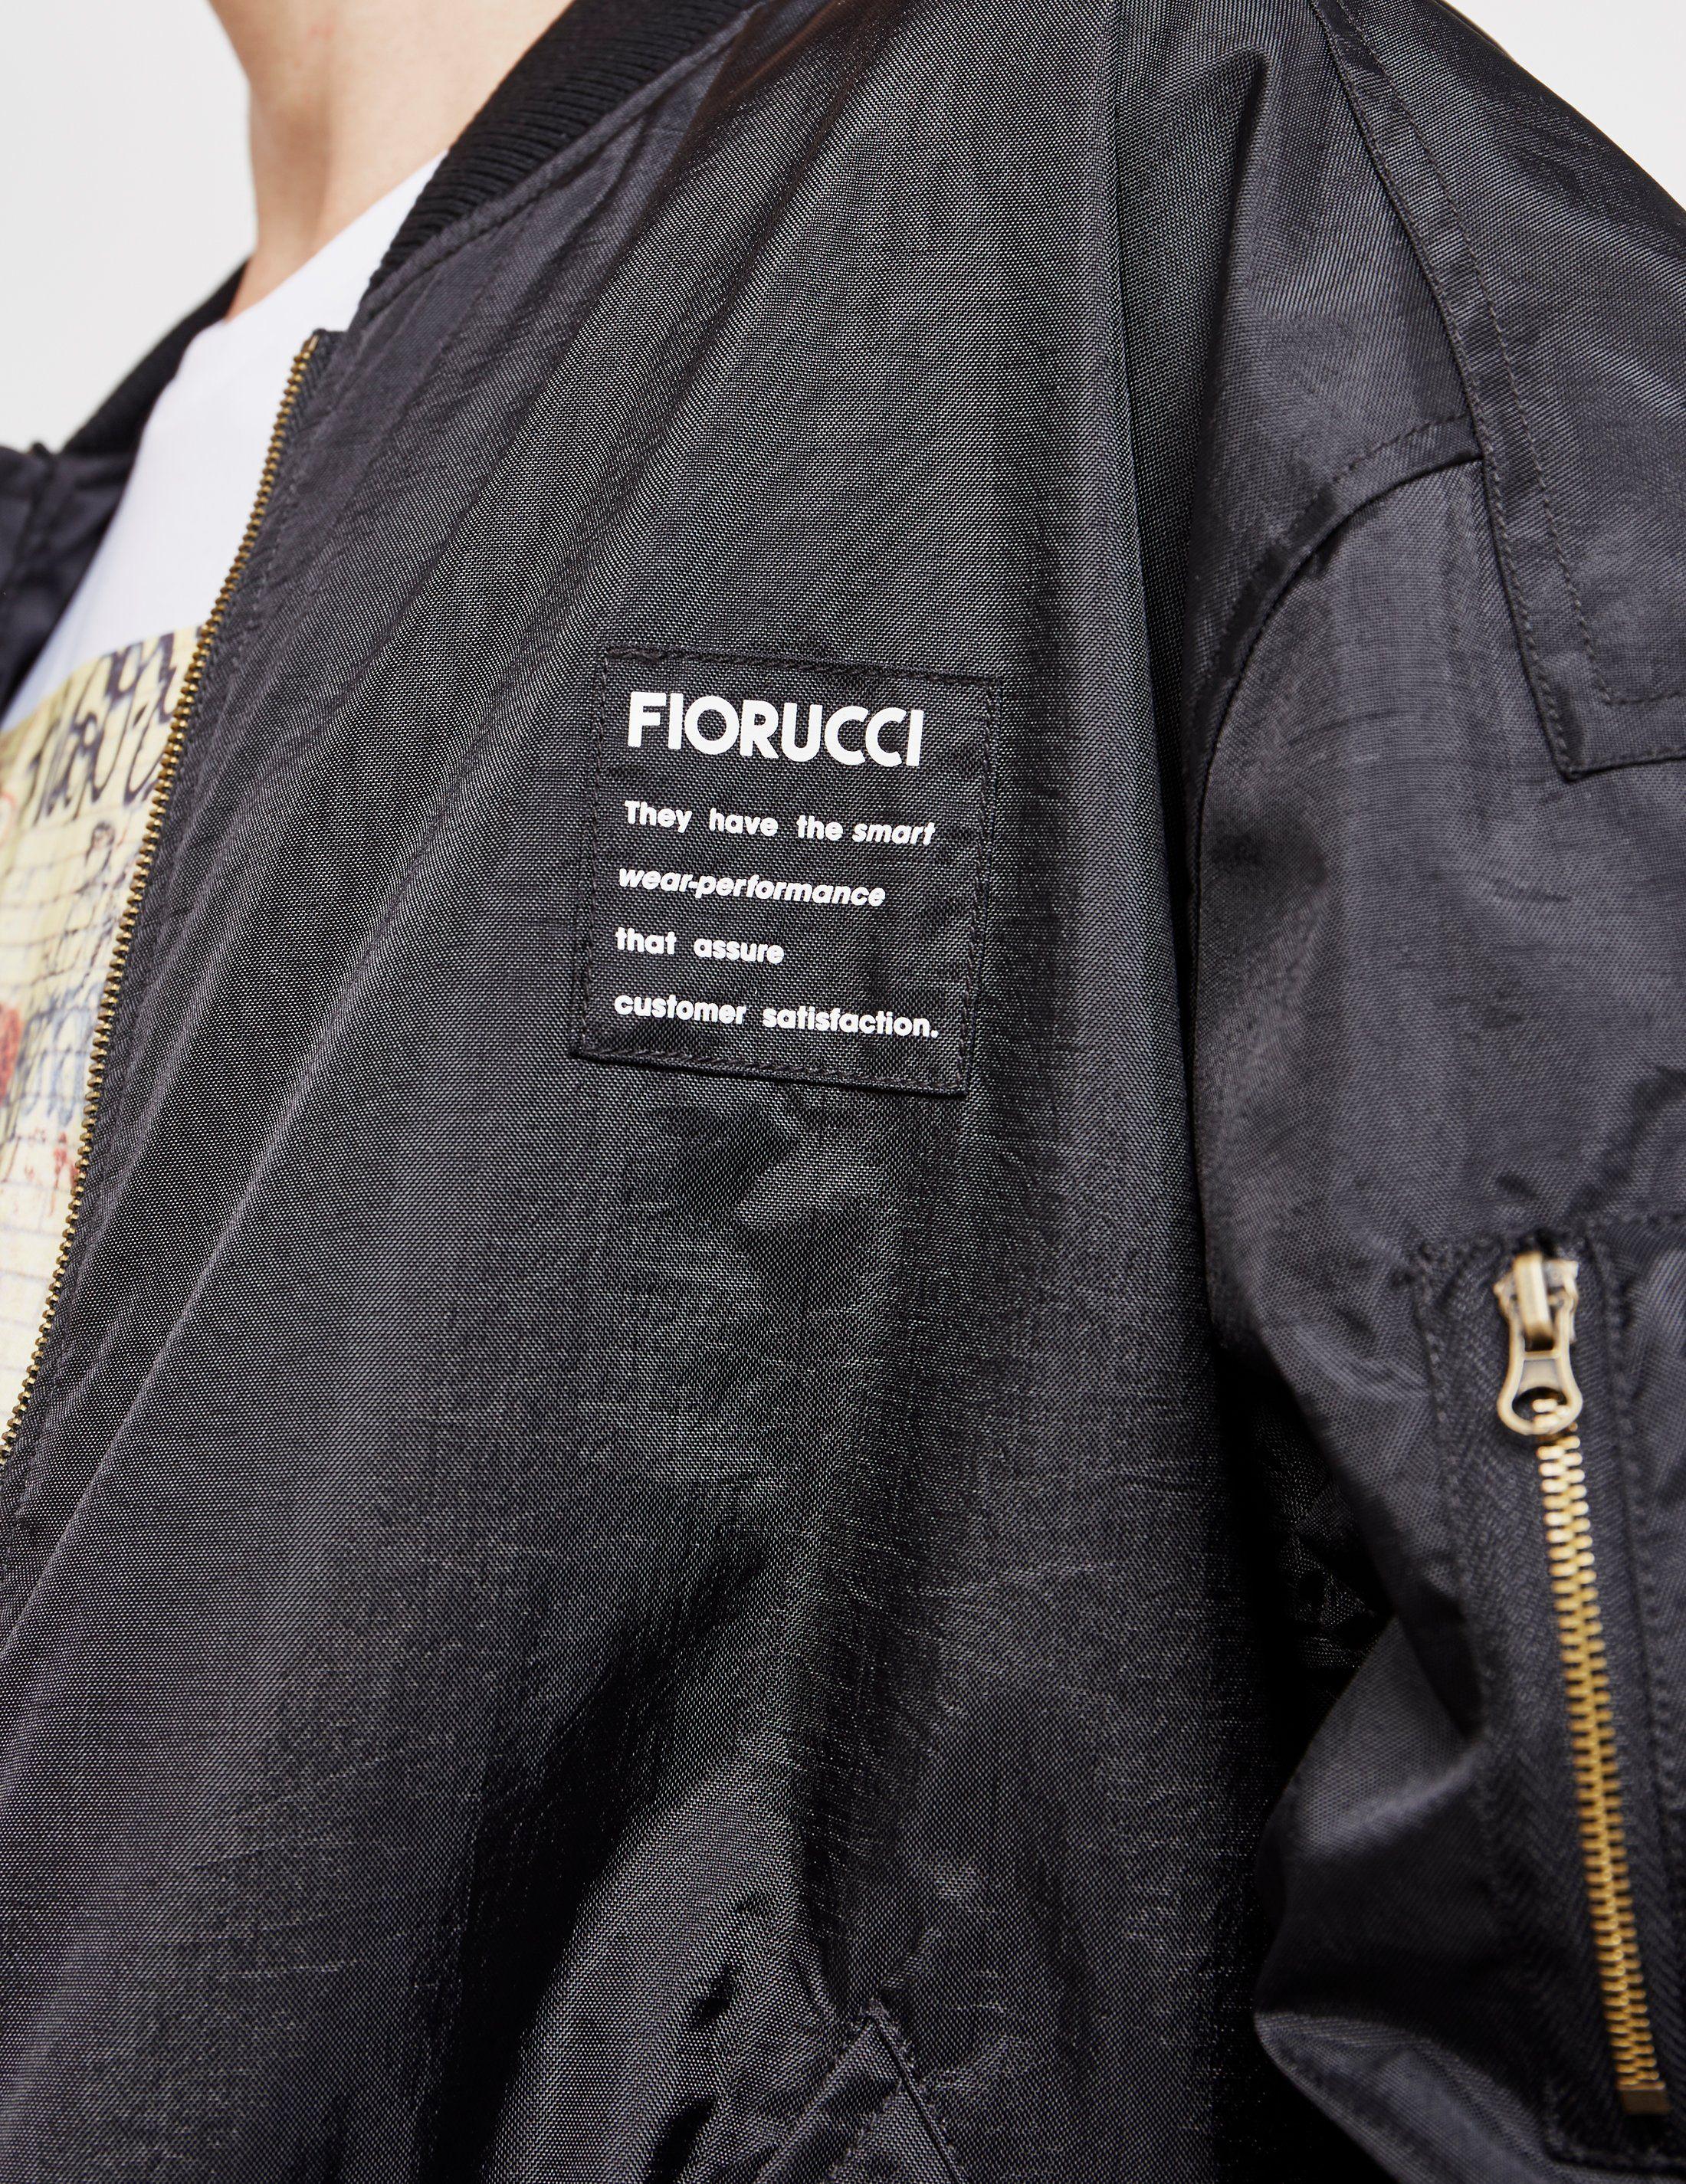 Fiorucci Equipe Bomber Jacket - Online Exclusive